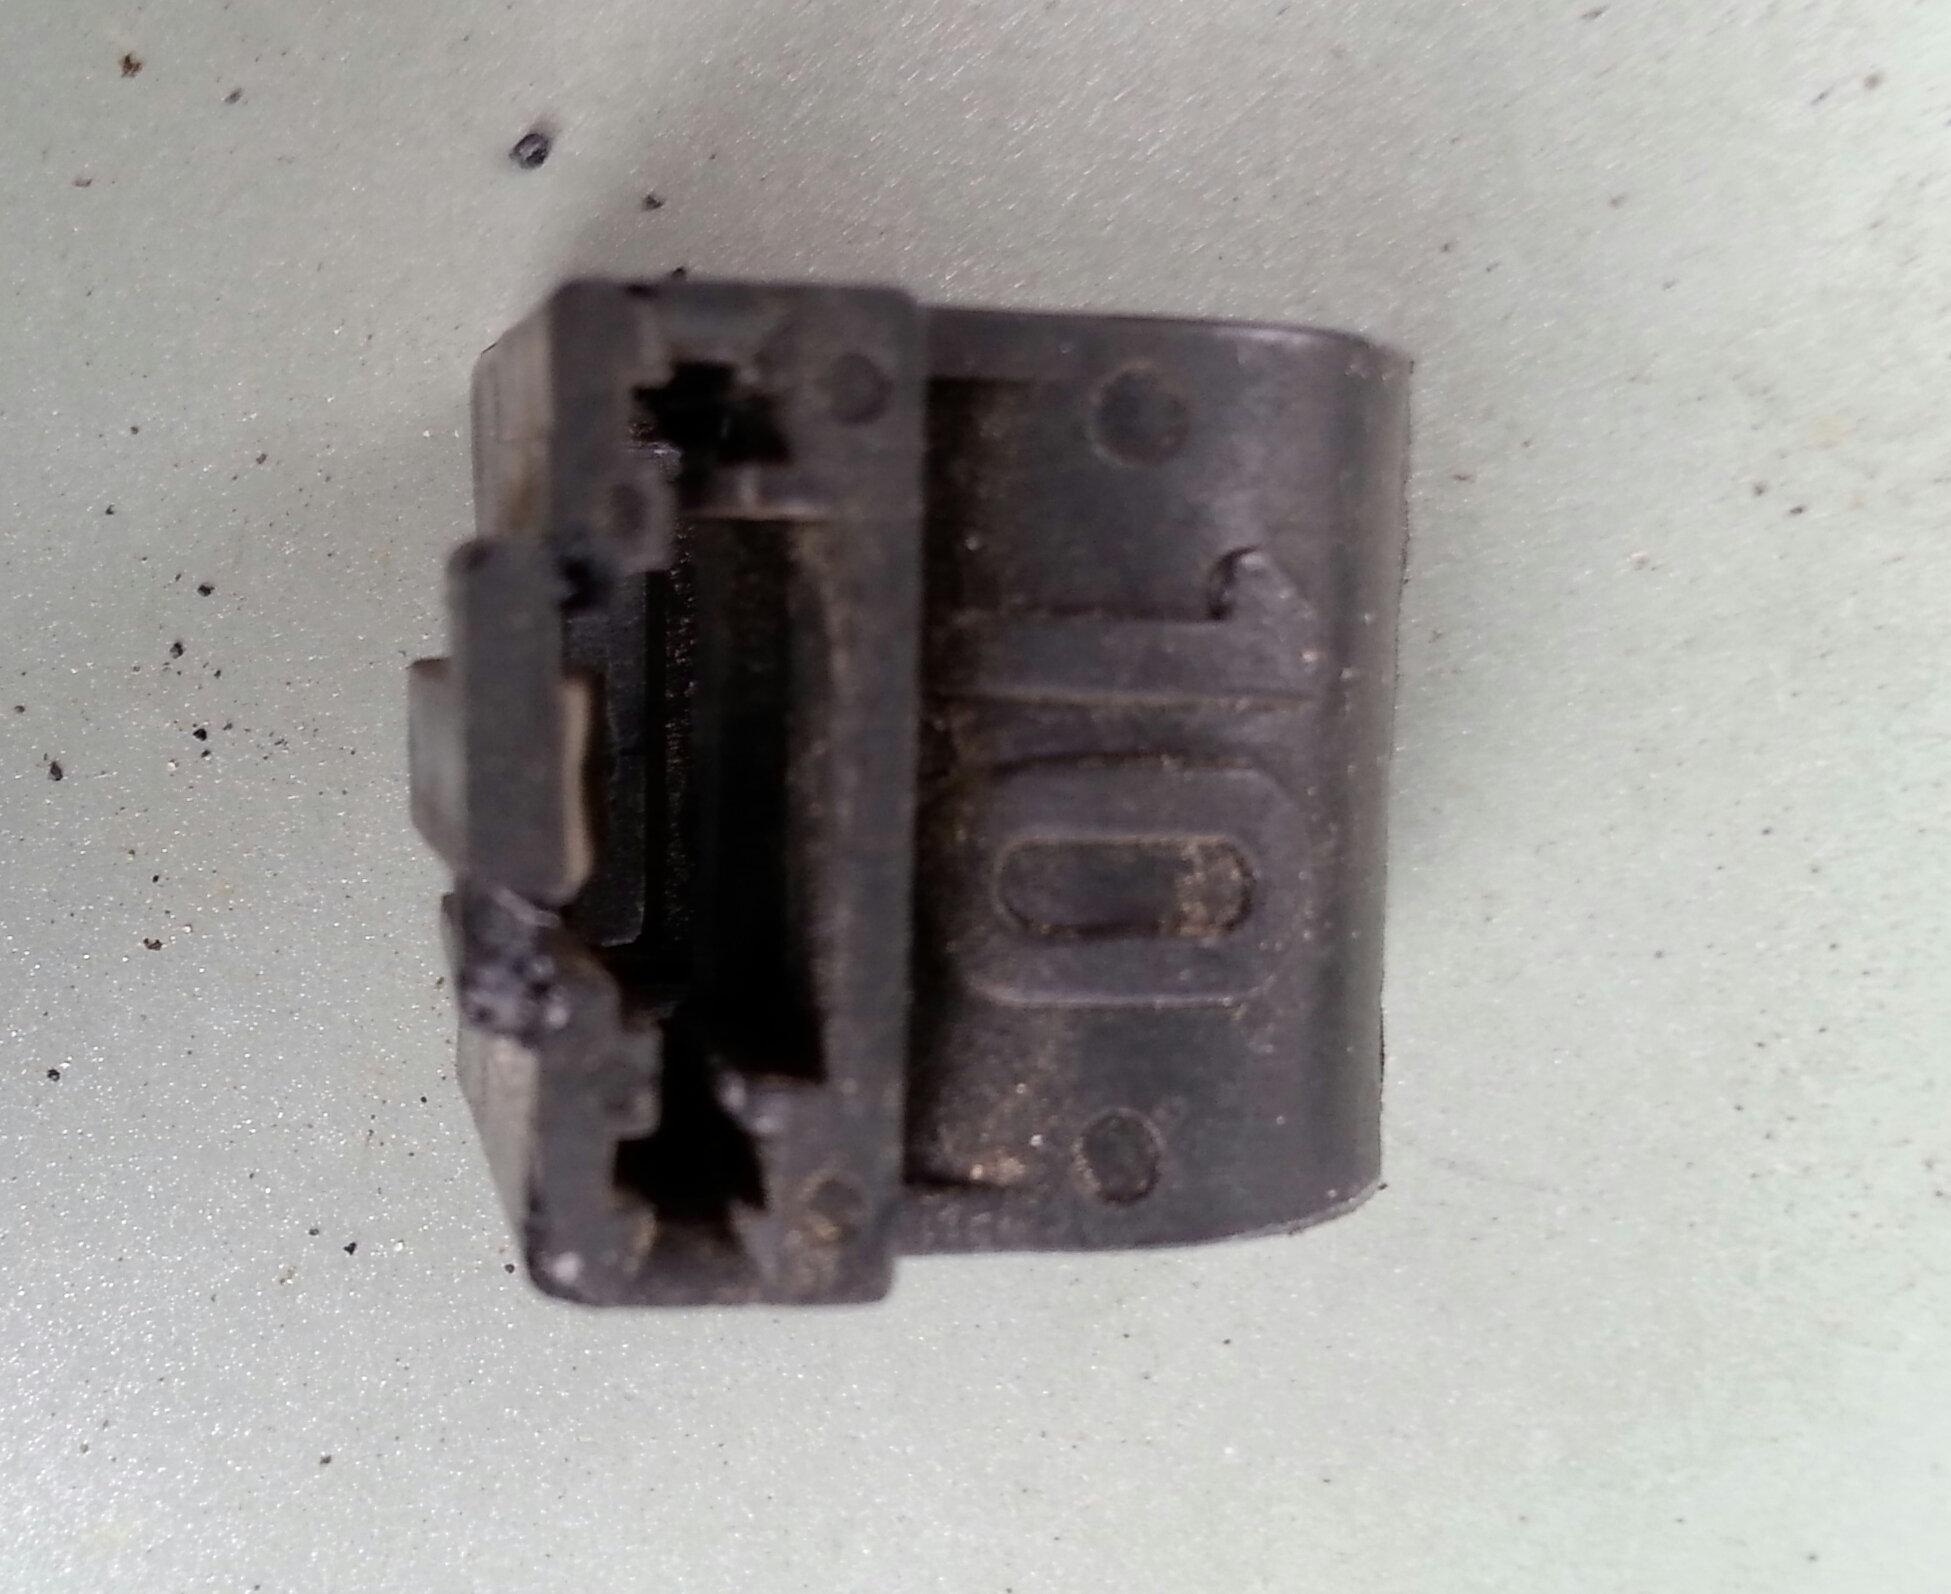 Push-on bracket clamp showing 10 mm inner diameter marking.